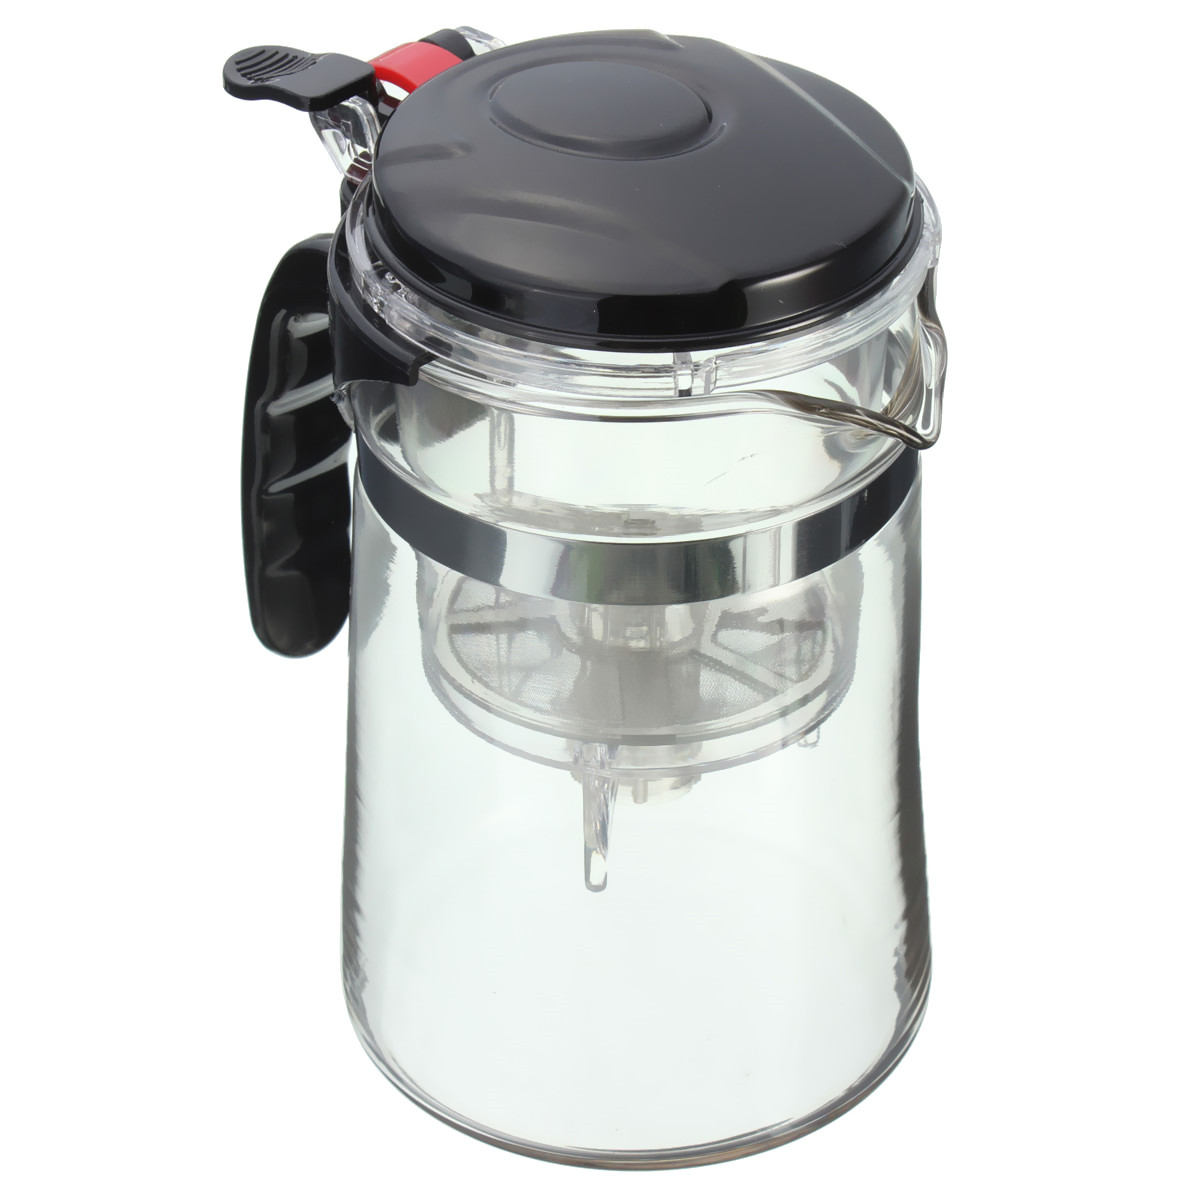 Glass Teapot Coffee Maker : Clear Glass Tea Coffee Maker Mug Pot With Filter Infuser Straight 500ml 17Oz Lazada PH